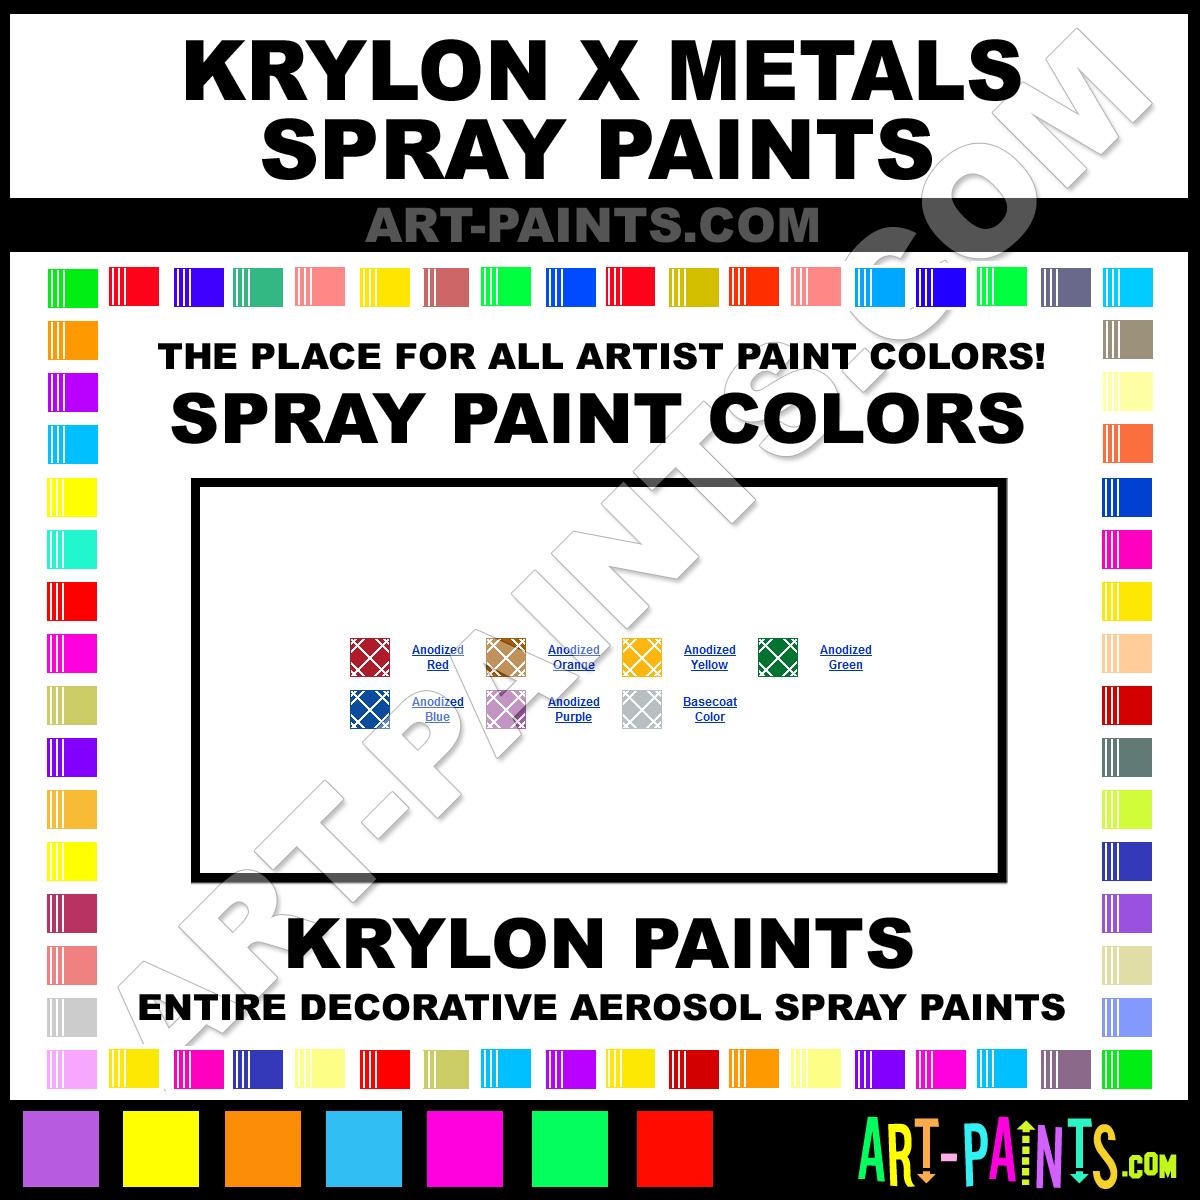 Krylon X Metals Spray Paint Aerosol Colors Krylon X Metals Paint Decorative Colors X Metals